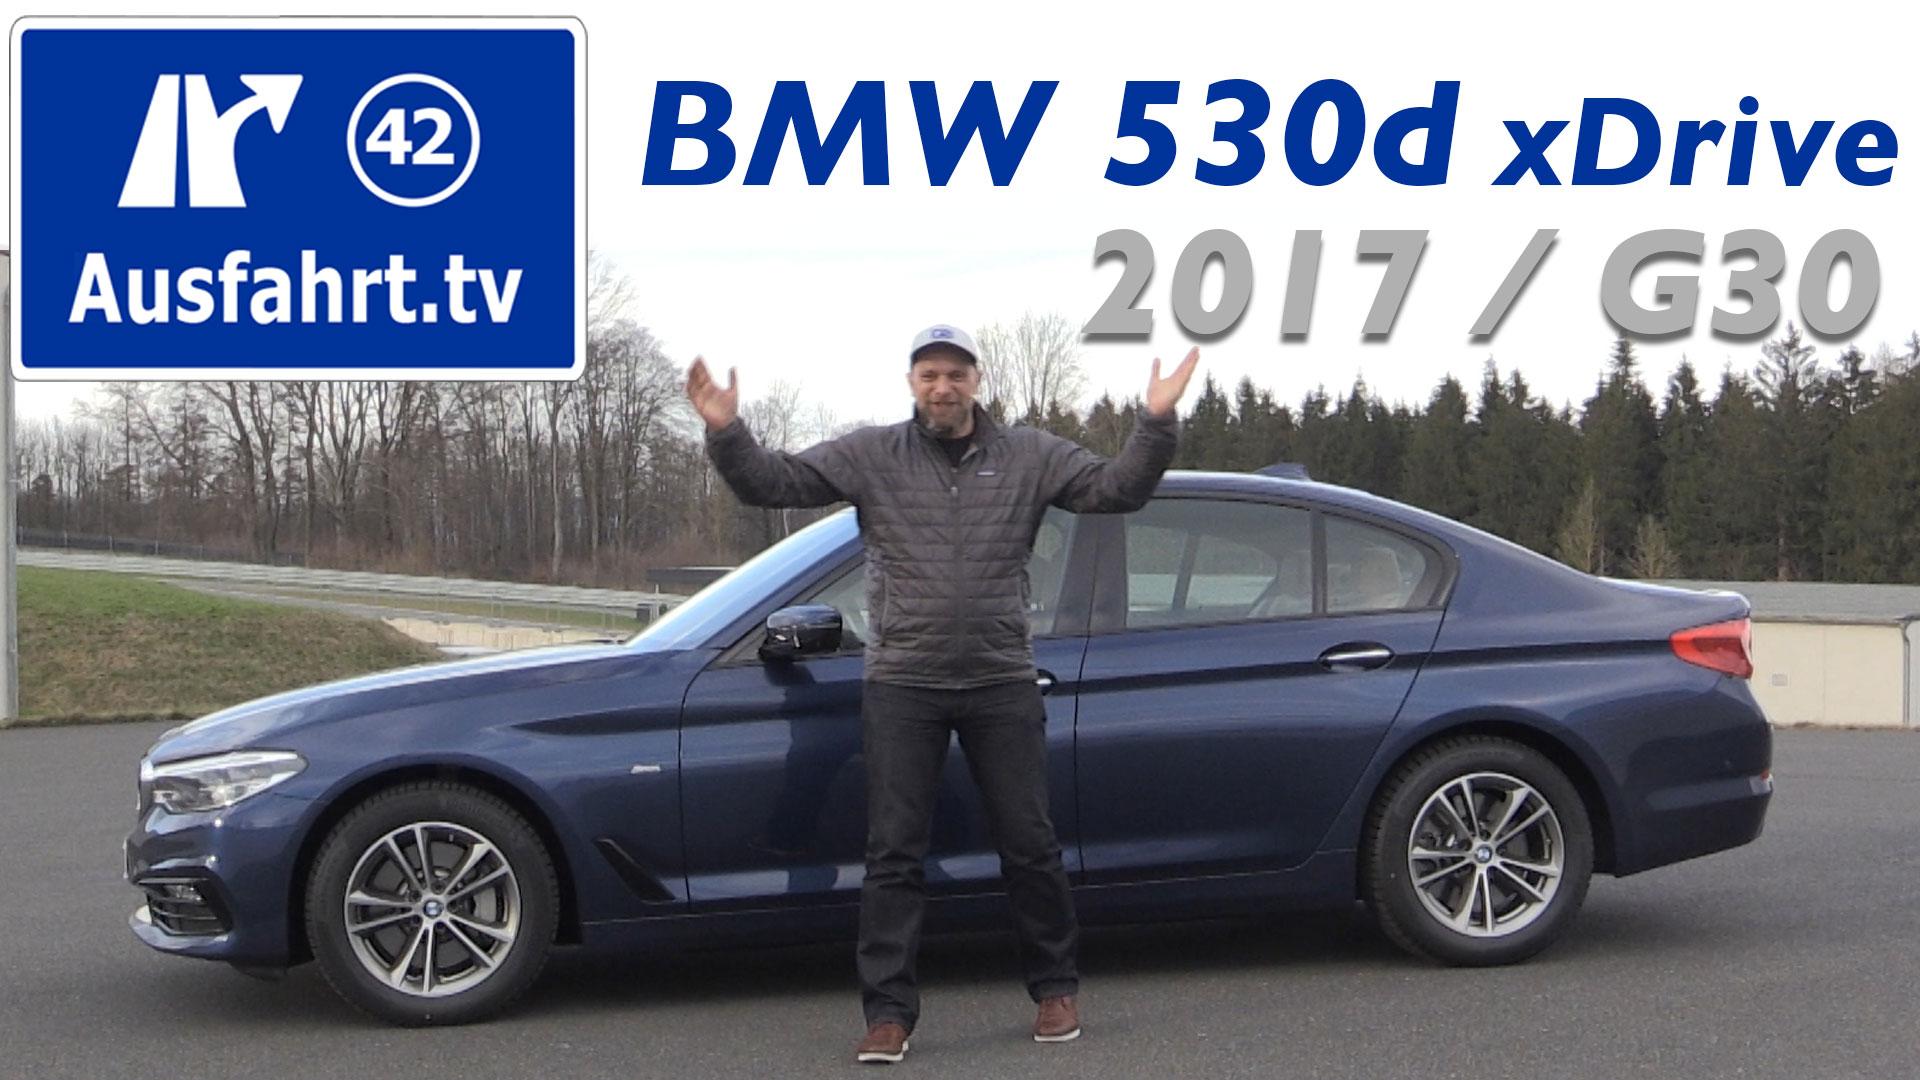 2017 Bmw 530d Xdrive Limousine G30 Ausfahrttv